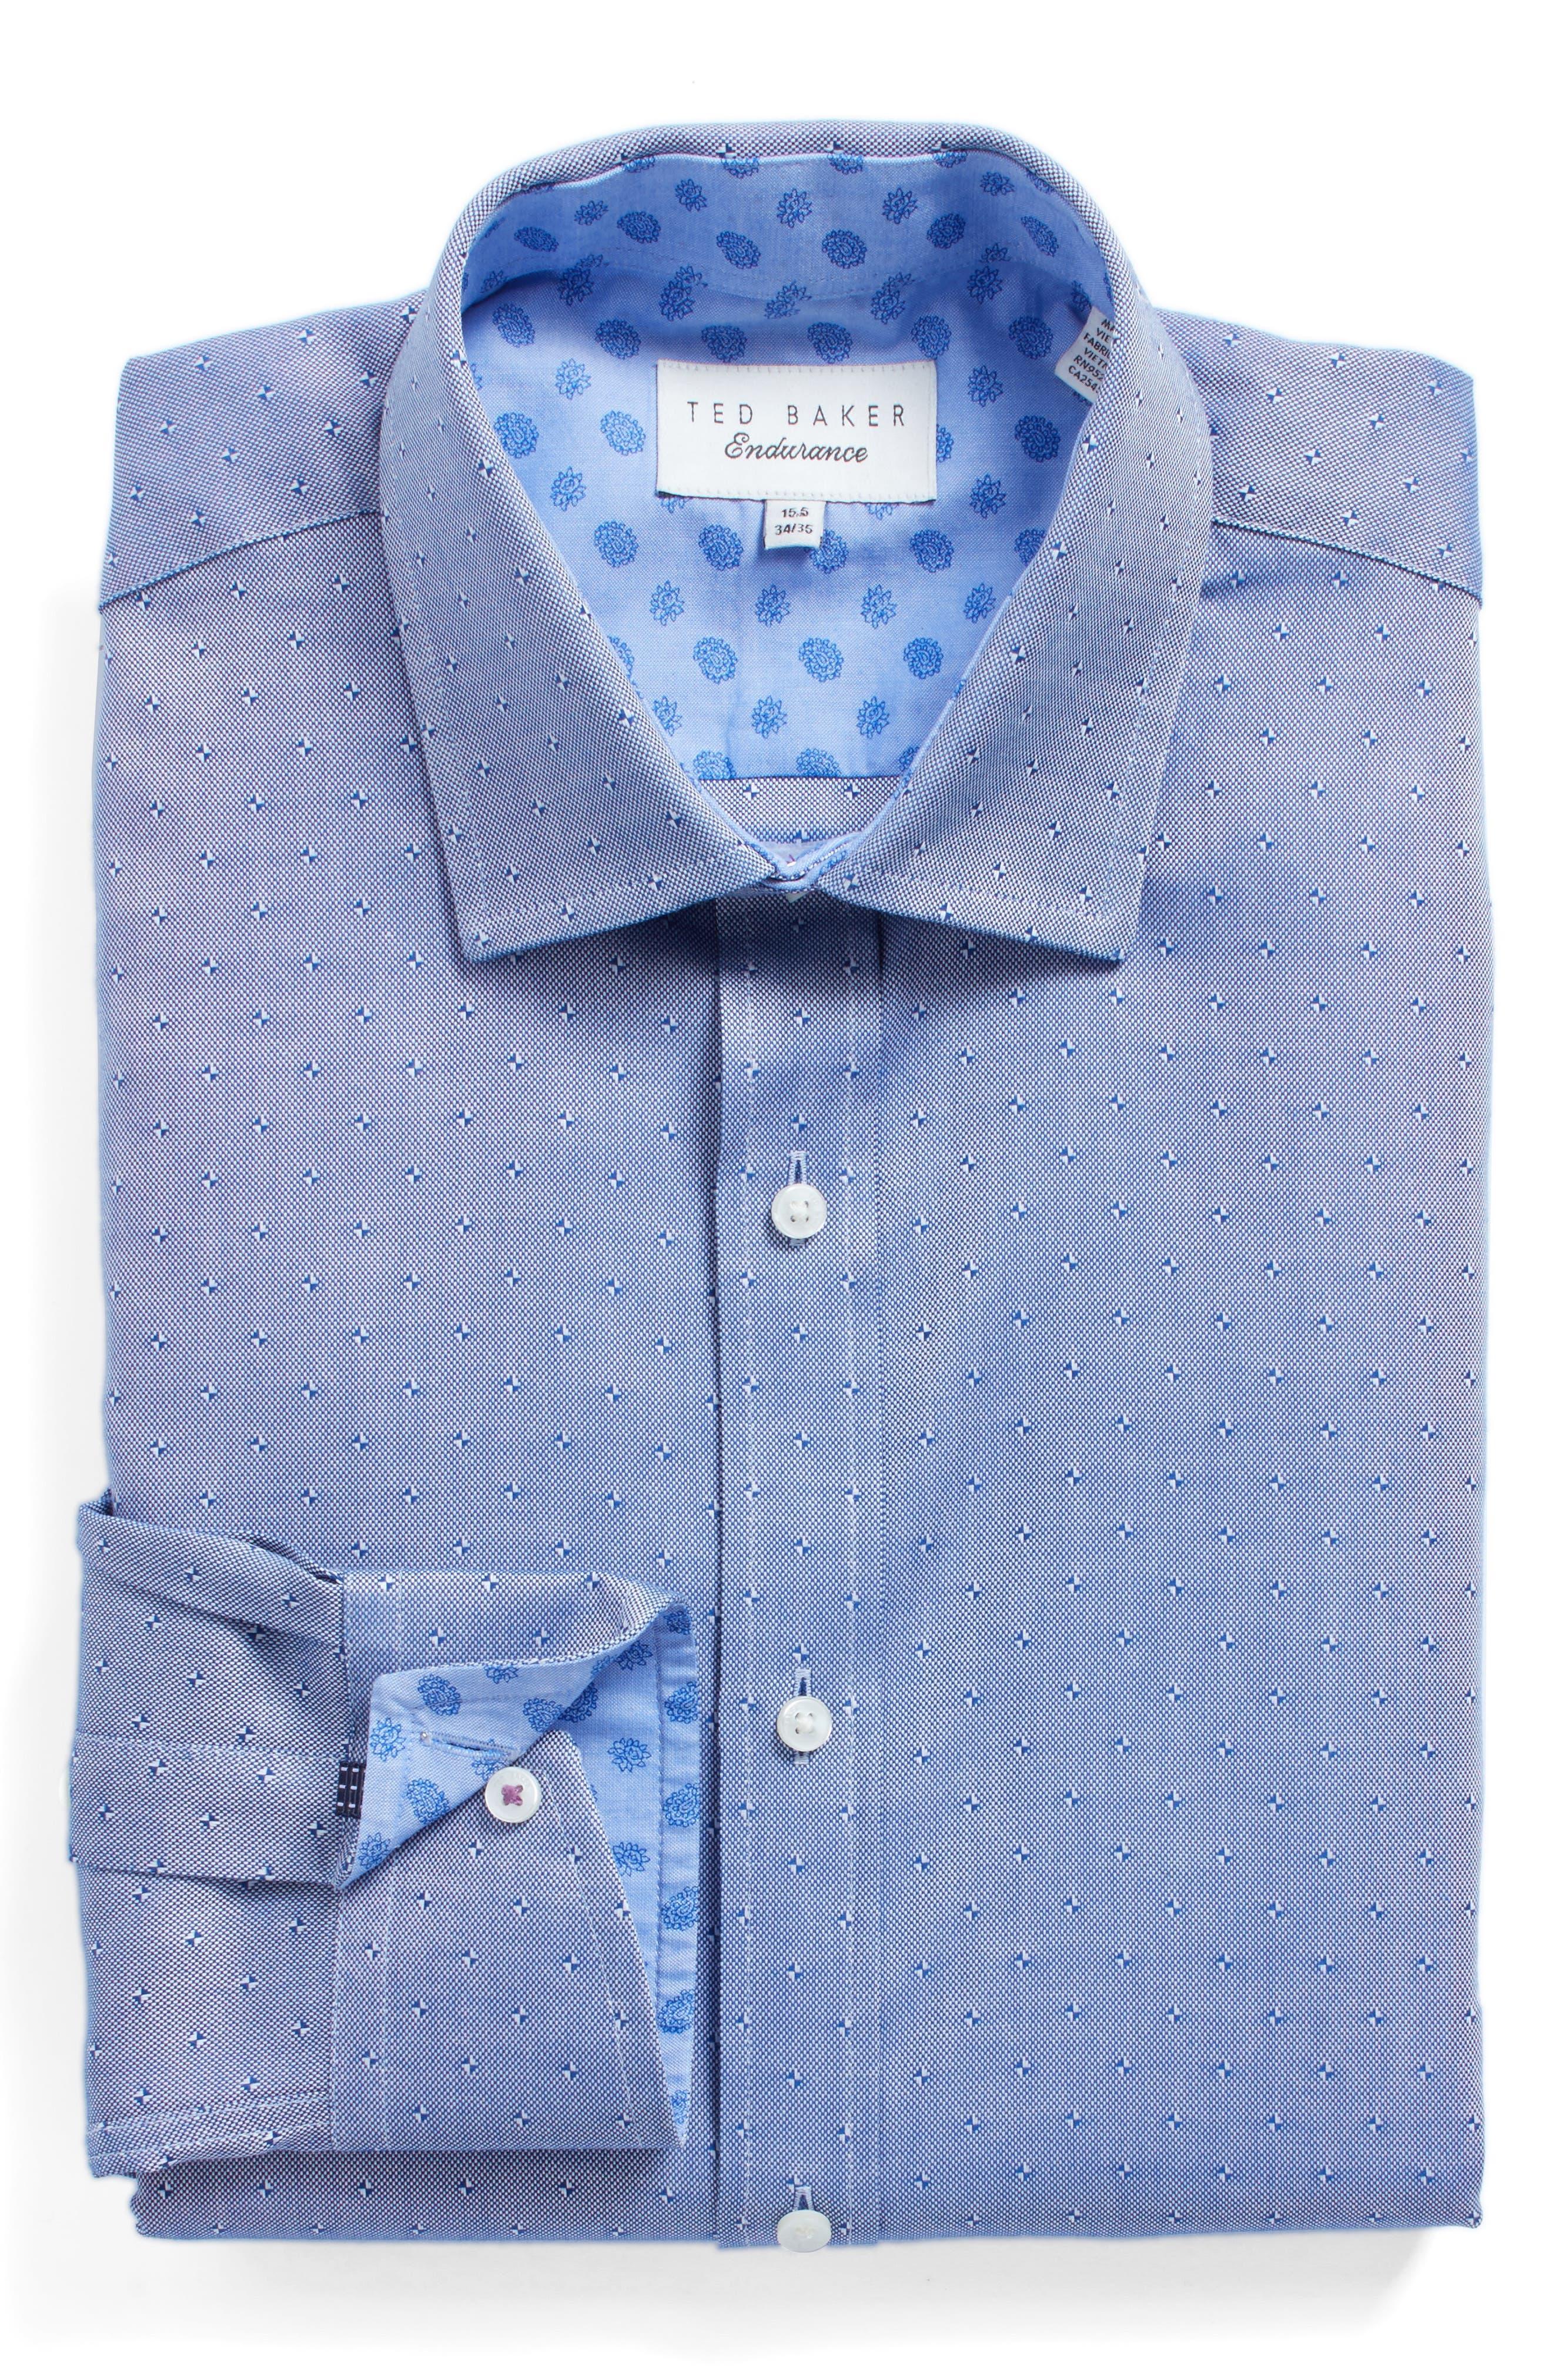 Jamer Trim Fit Dot Dress Shirt,                             Main thumbnail 1, color,                             Navy